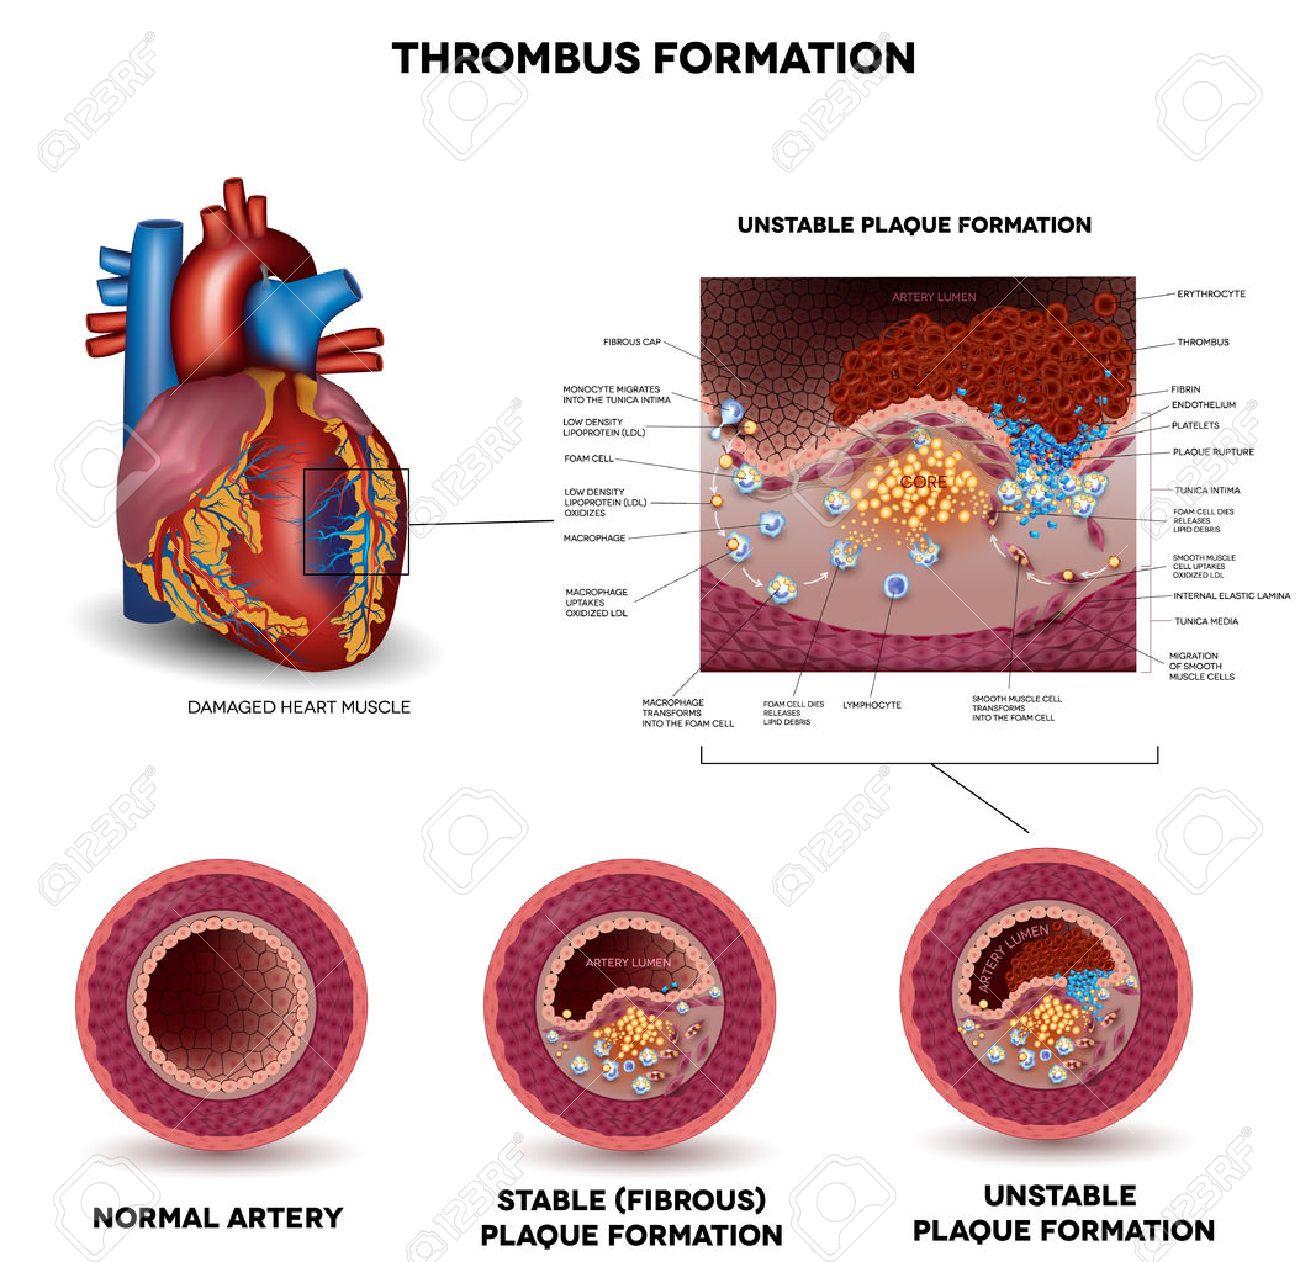 sinais de sintomas cardíacos no coágulo sanguíneo